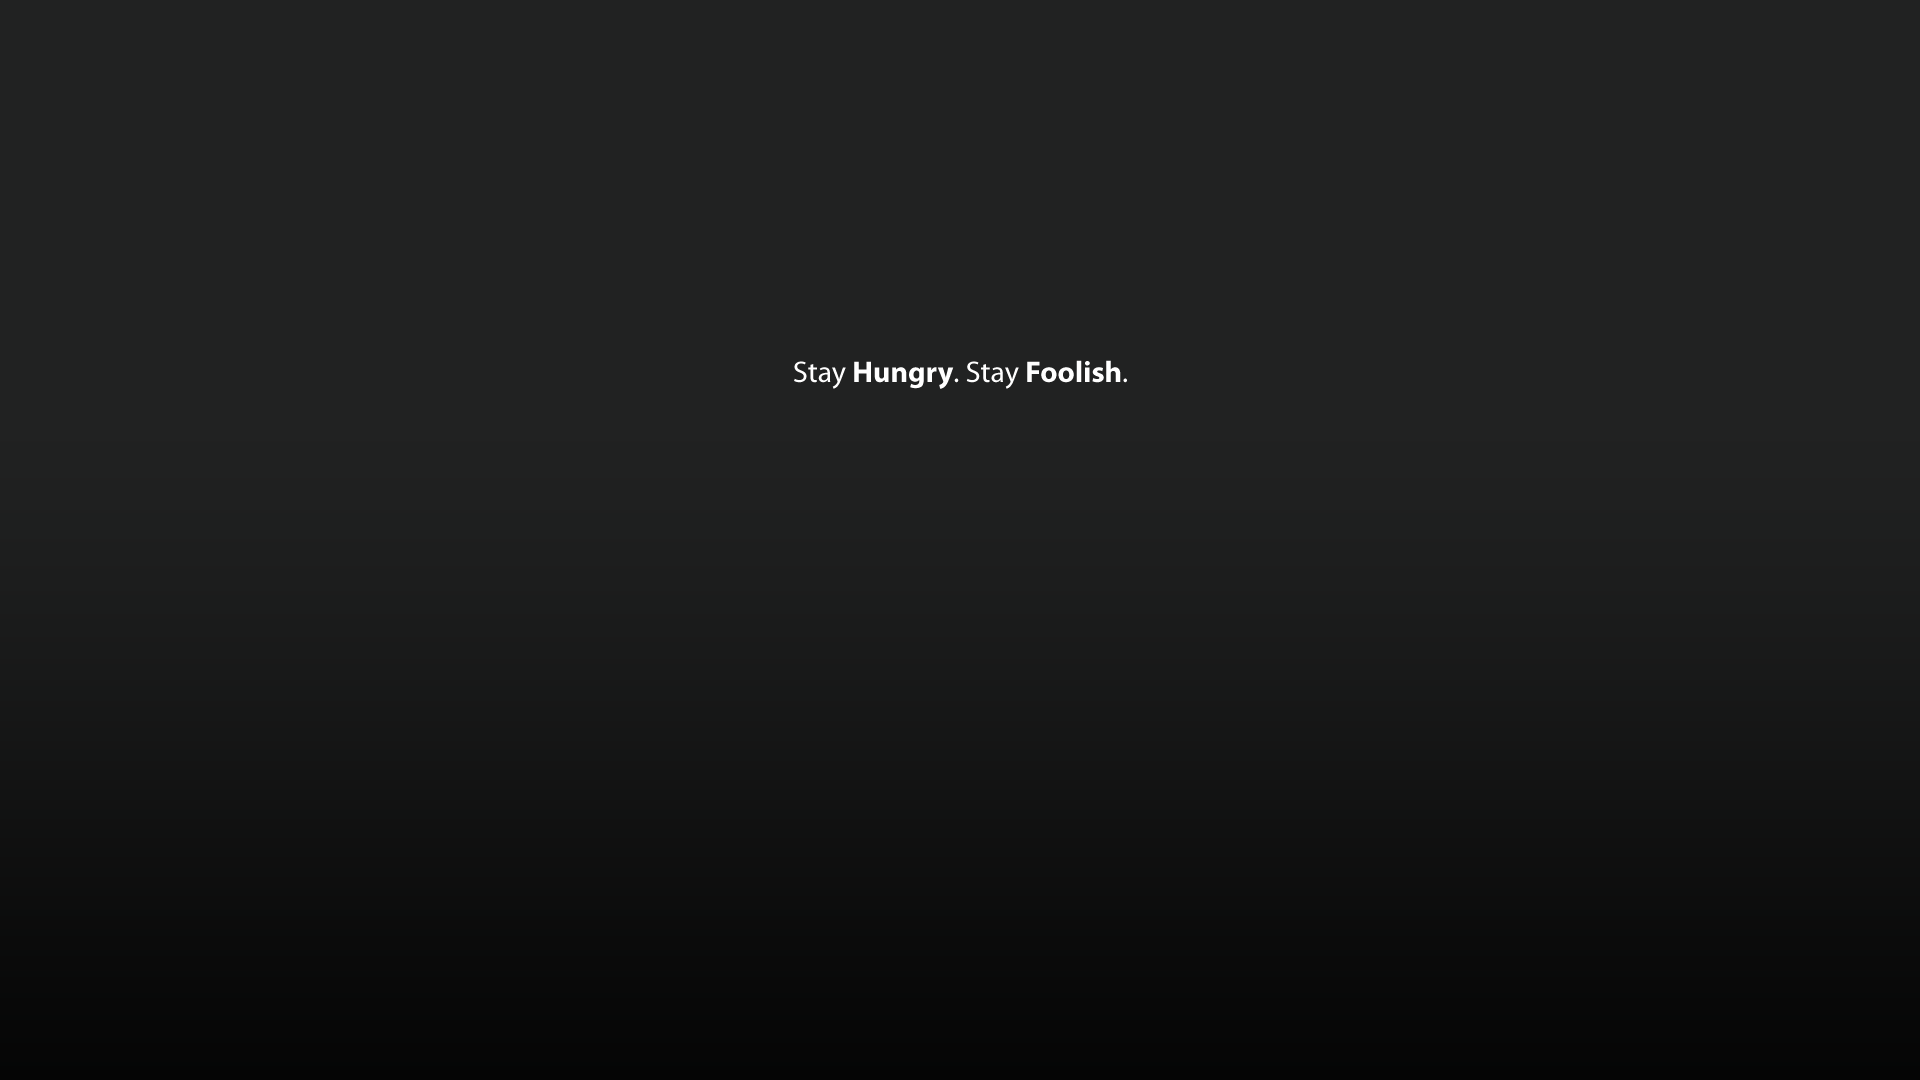 stayhungry-stayfoolish